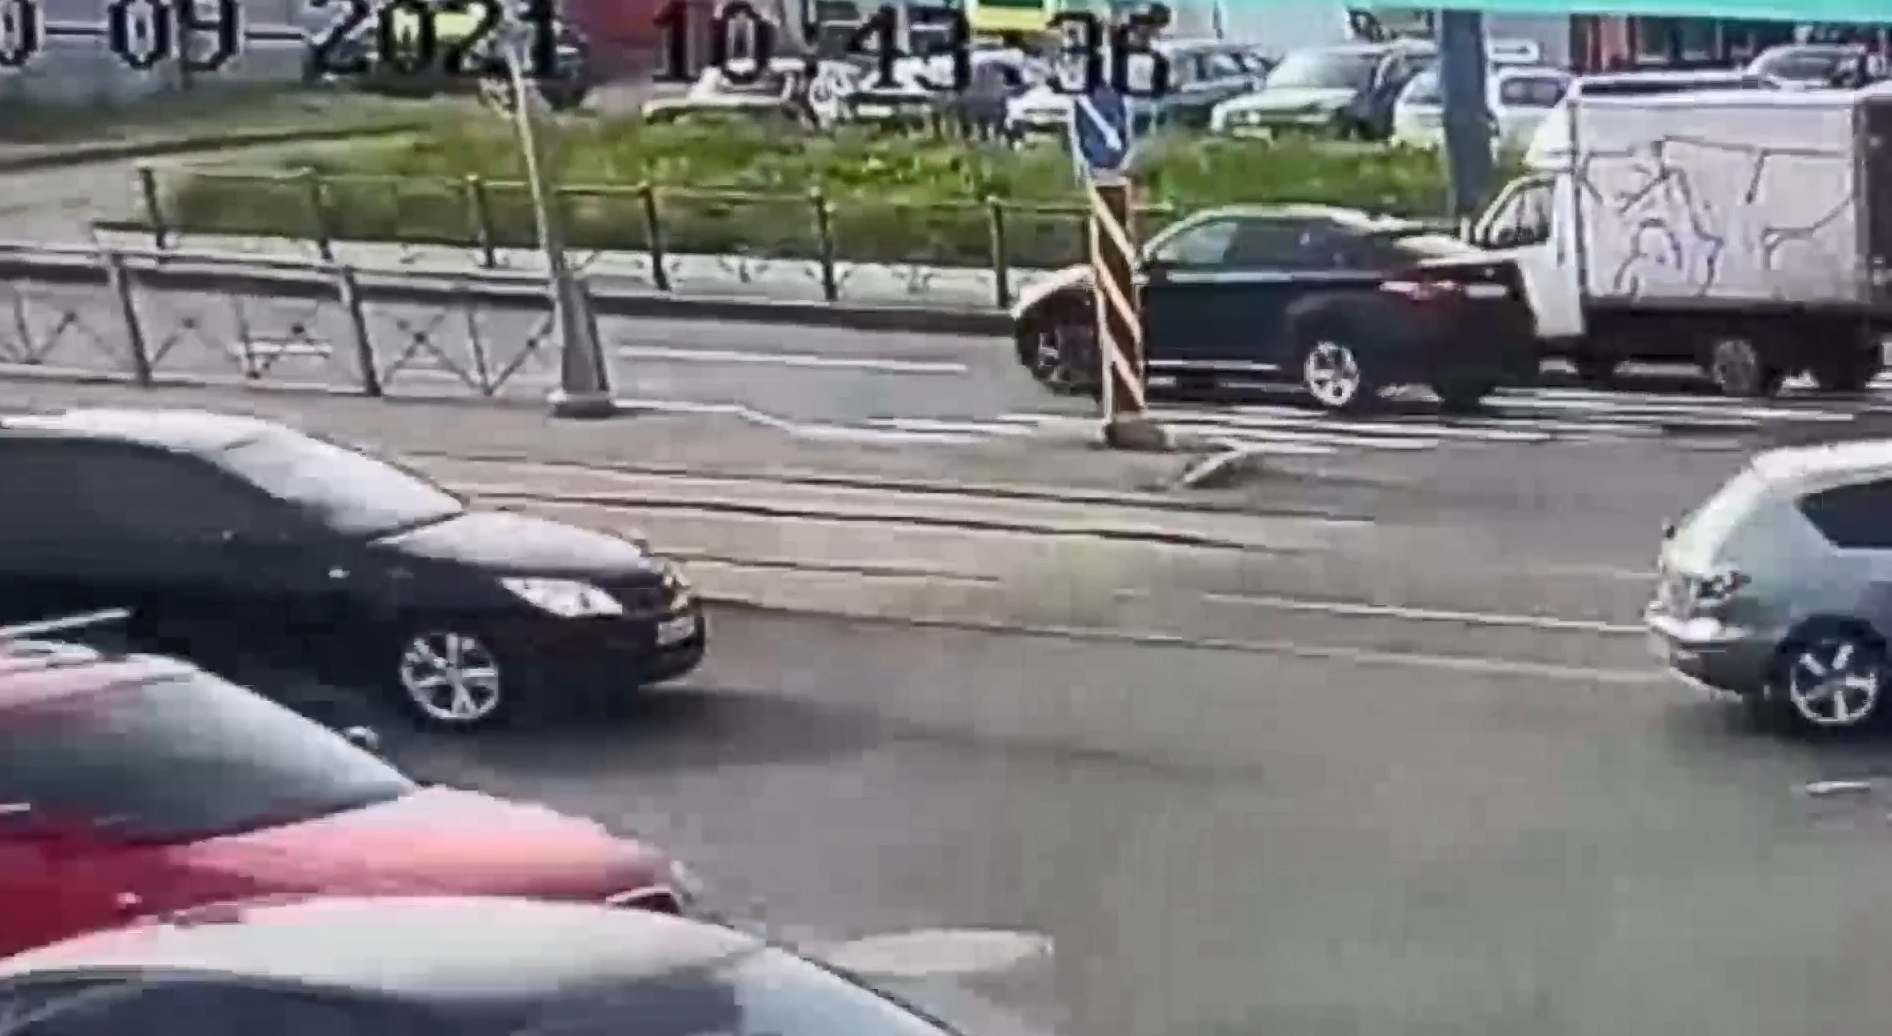 Фото: кадр видео ГУ МВД по Петербургу и Ленобласти